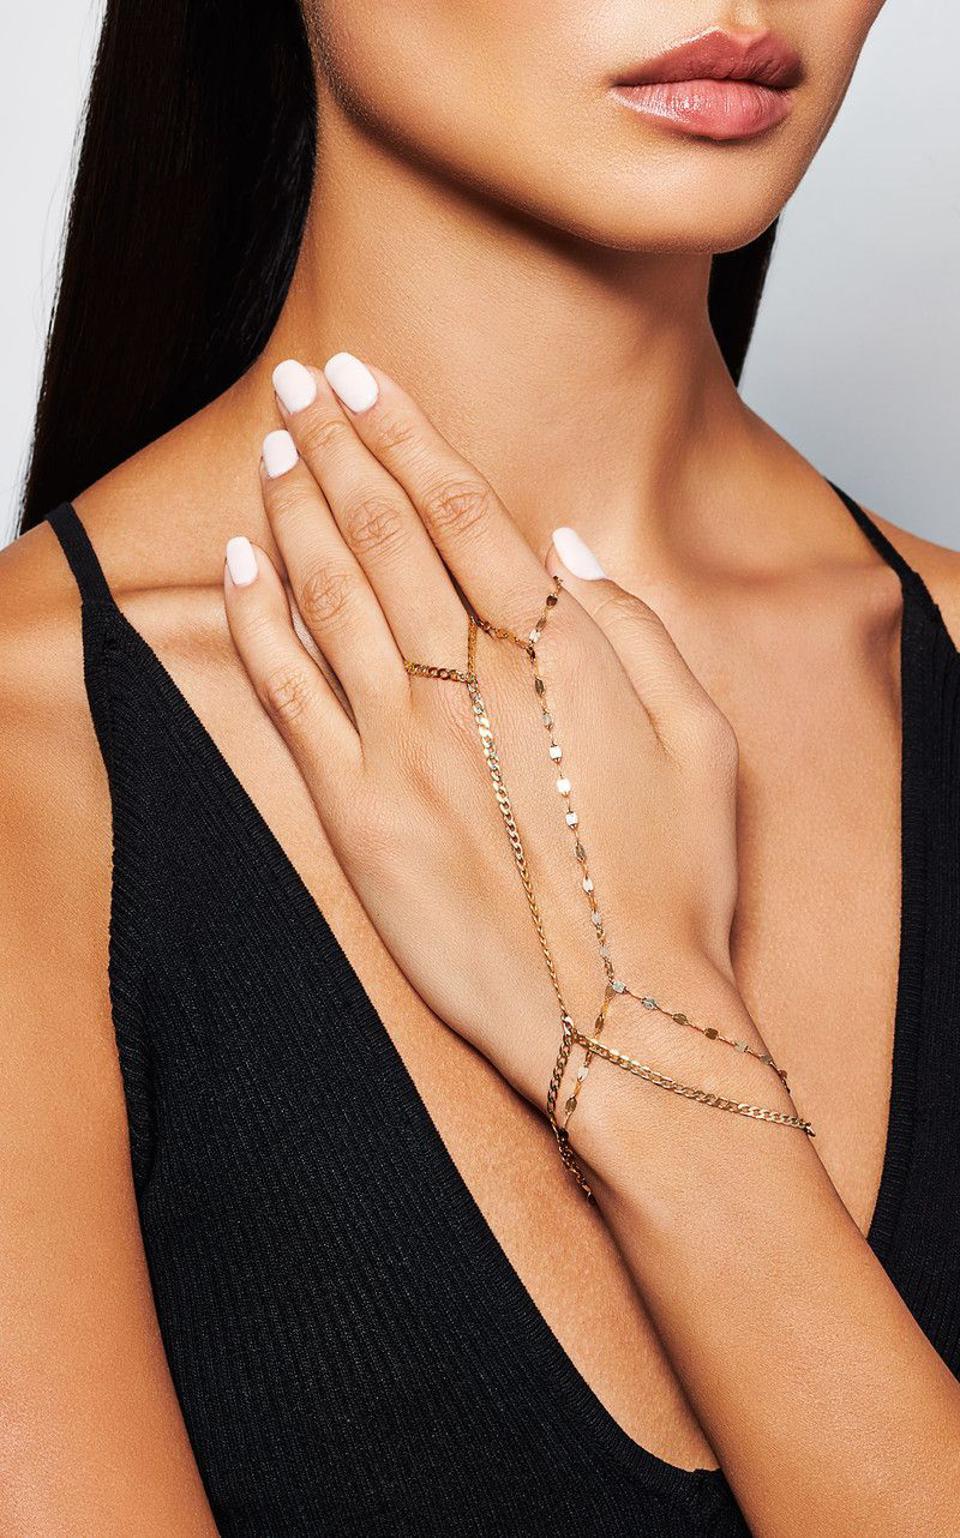 Lana Jewelry Hand Lariats